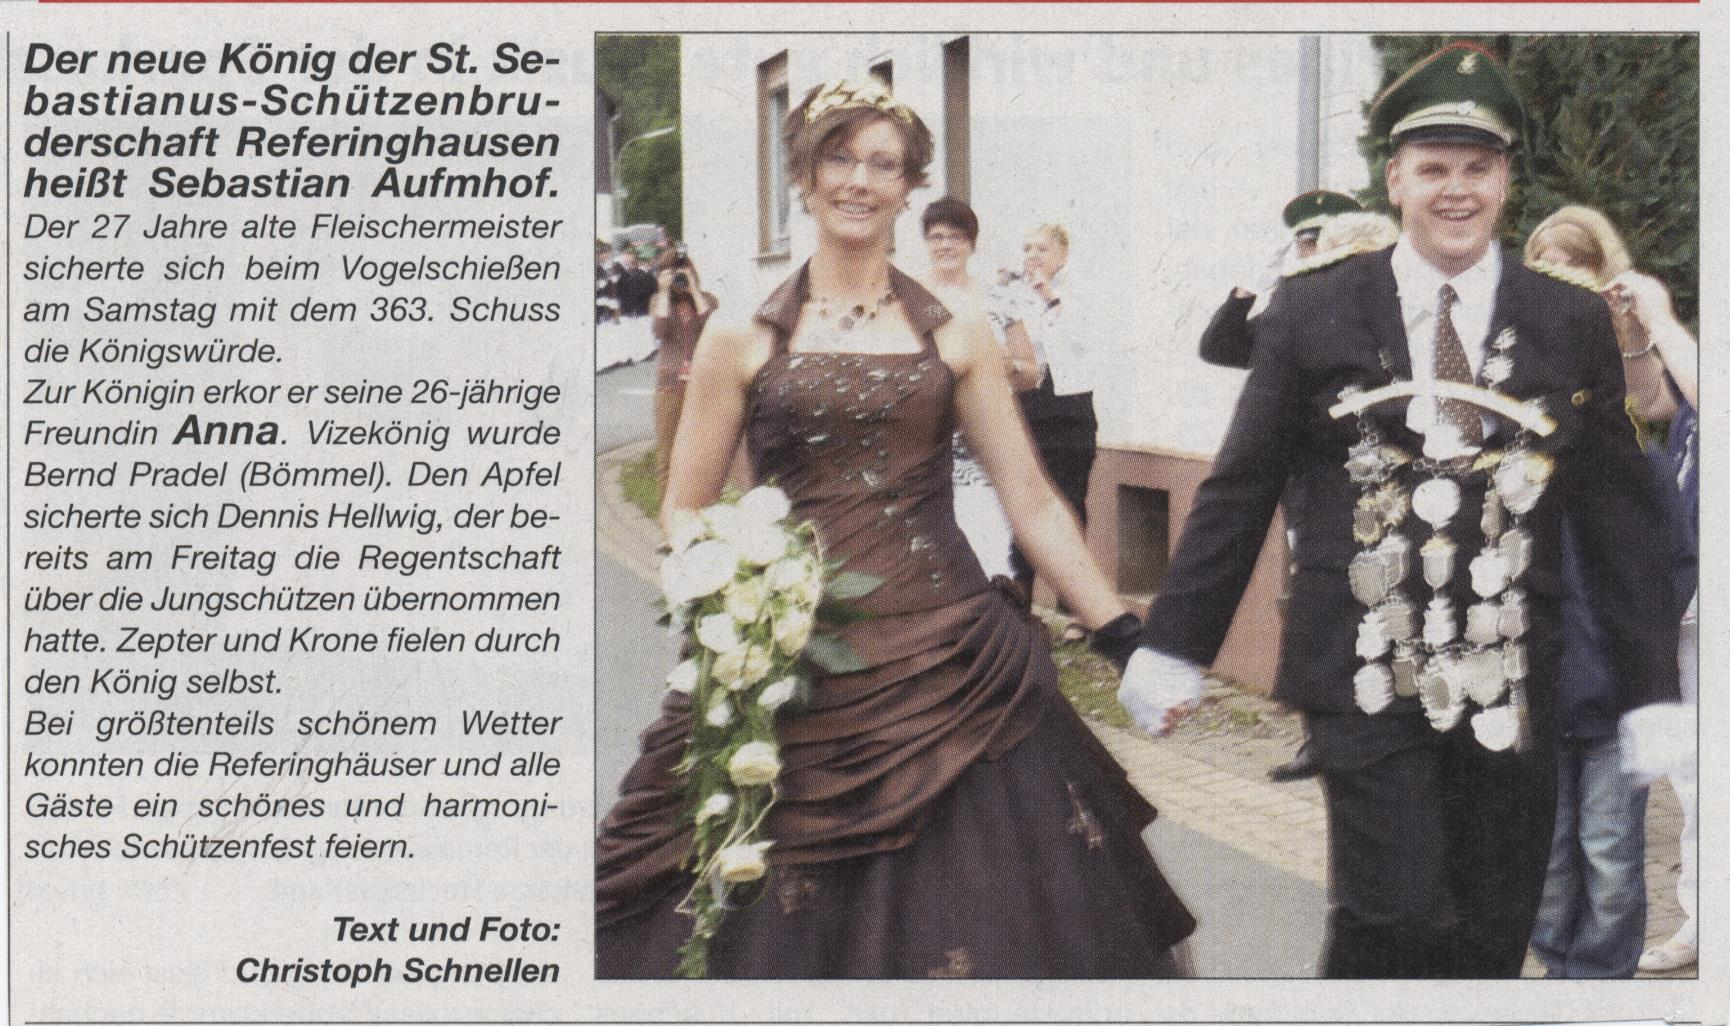 Schützenkönigspaar Sebastian und Anna